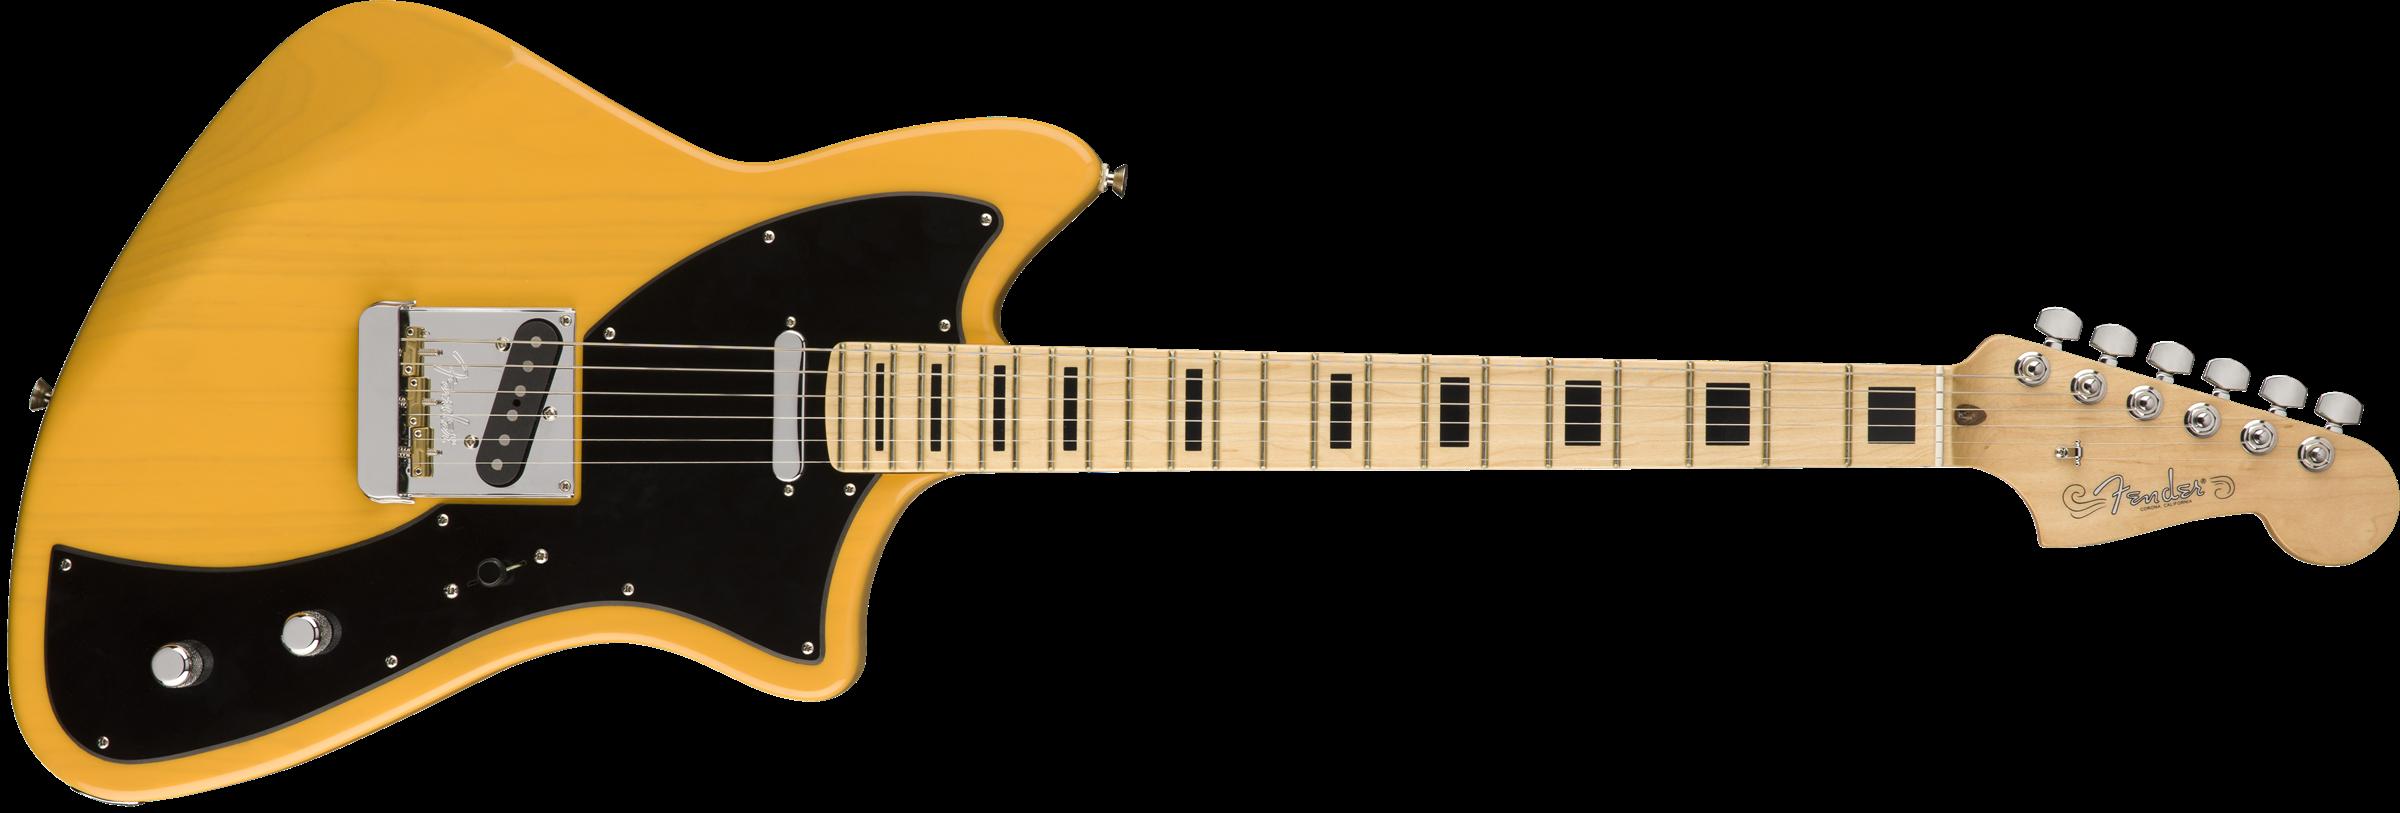 FENDER Limited Edition Meteora, Maple Fingerboard, Butterscotch Blonde